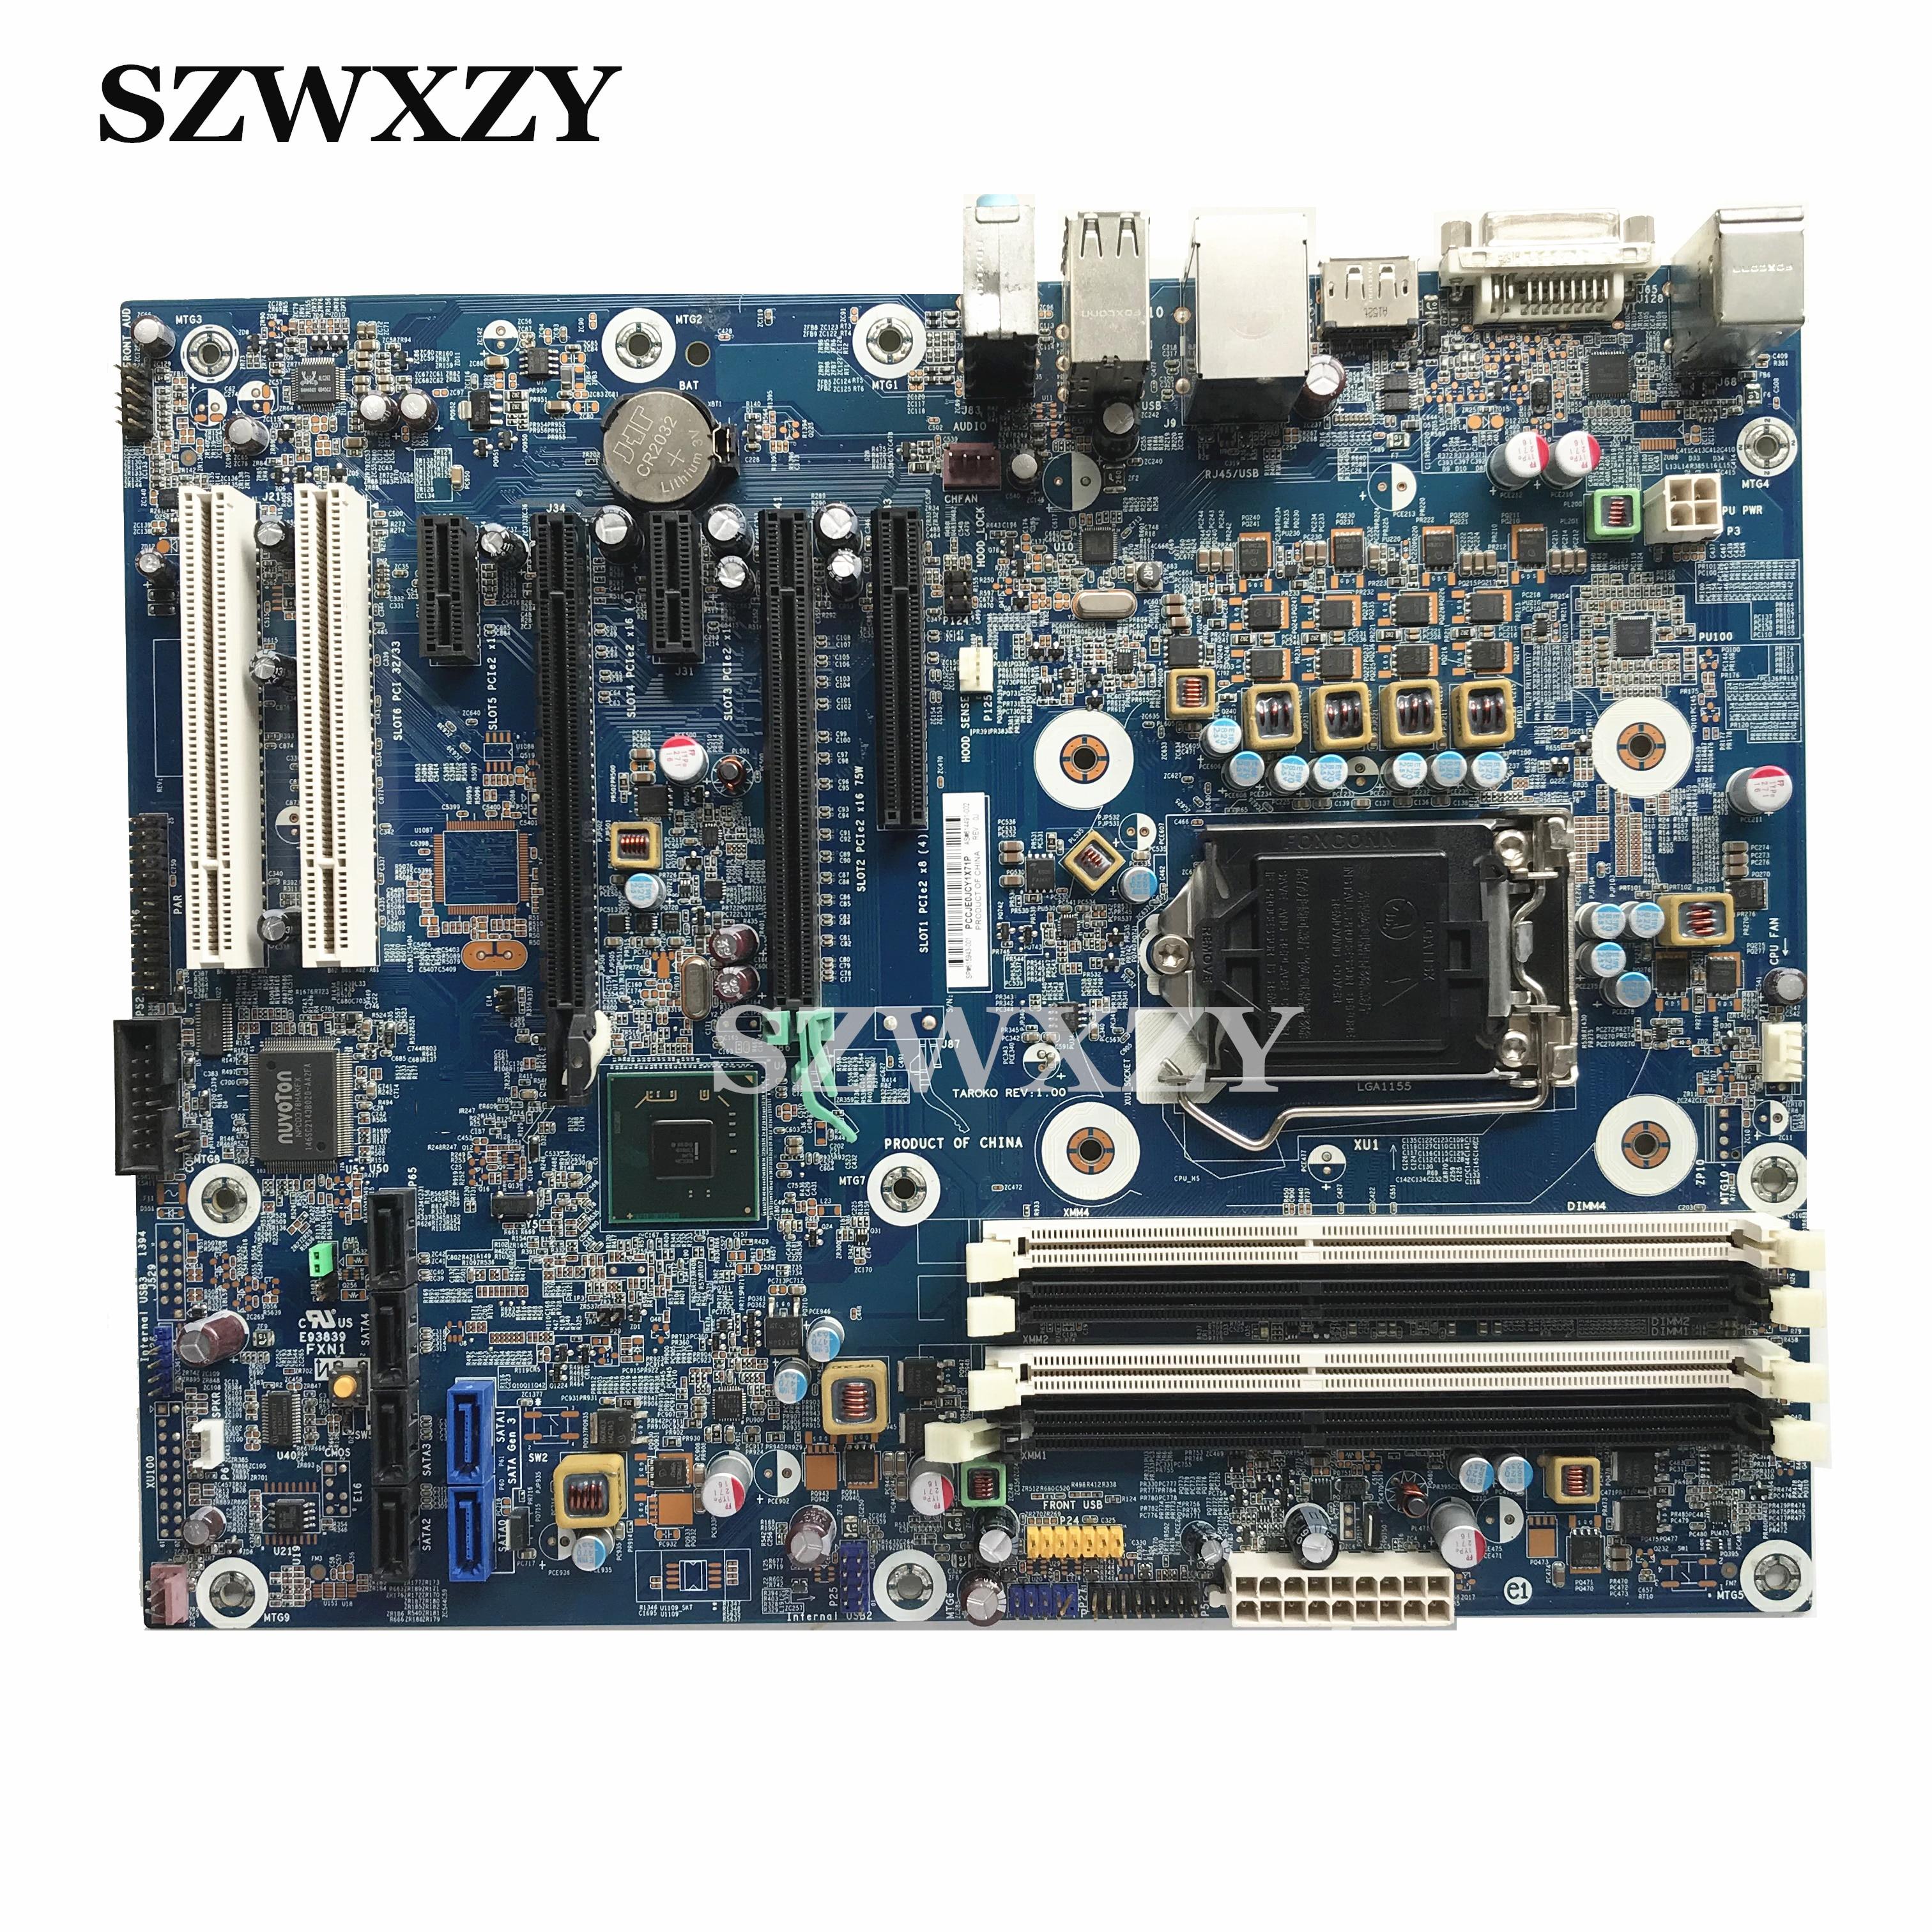 Original For HP Z210 Workstation Desktop Motherboard 615943 001 614491 002 LGA1155 Full Tested Free Shipping